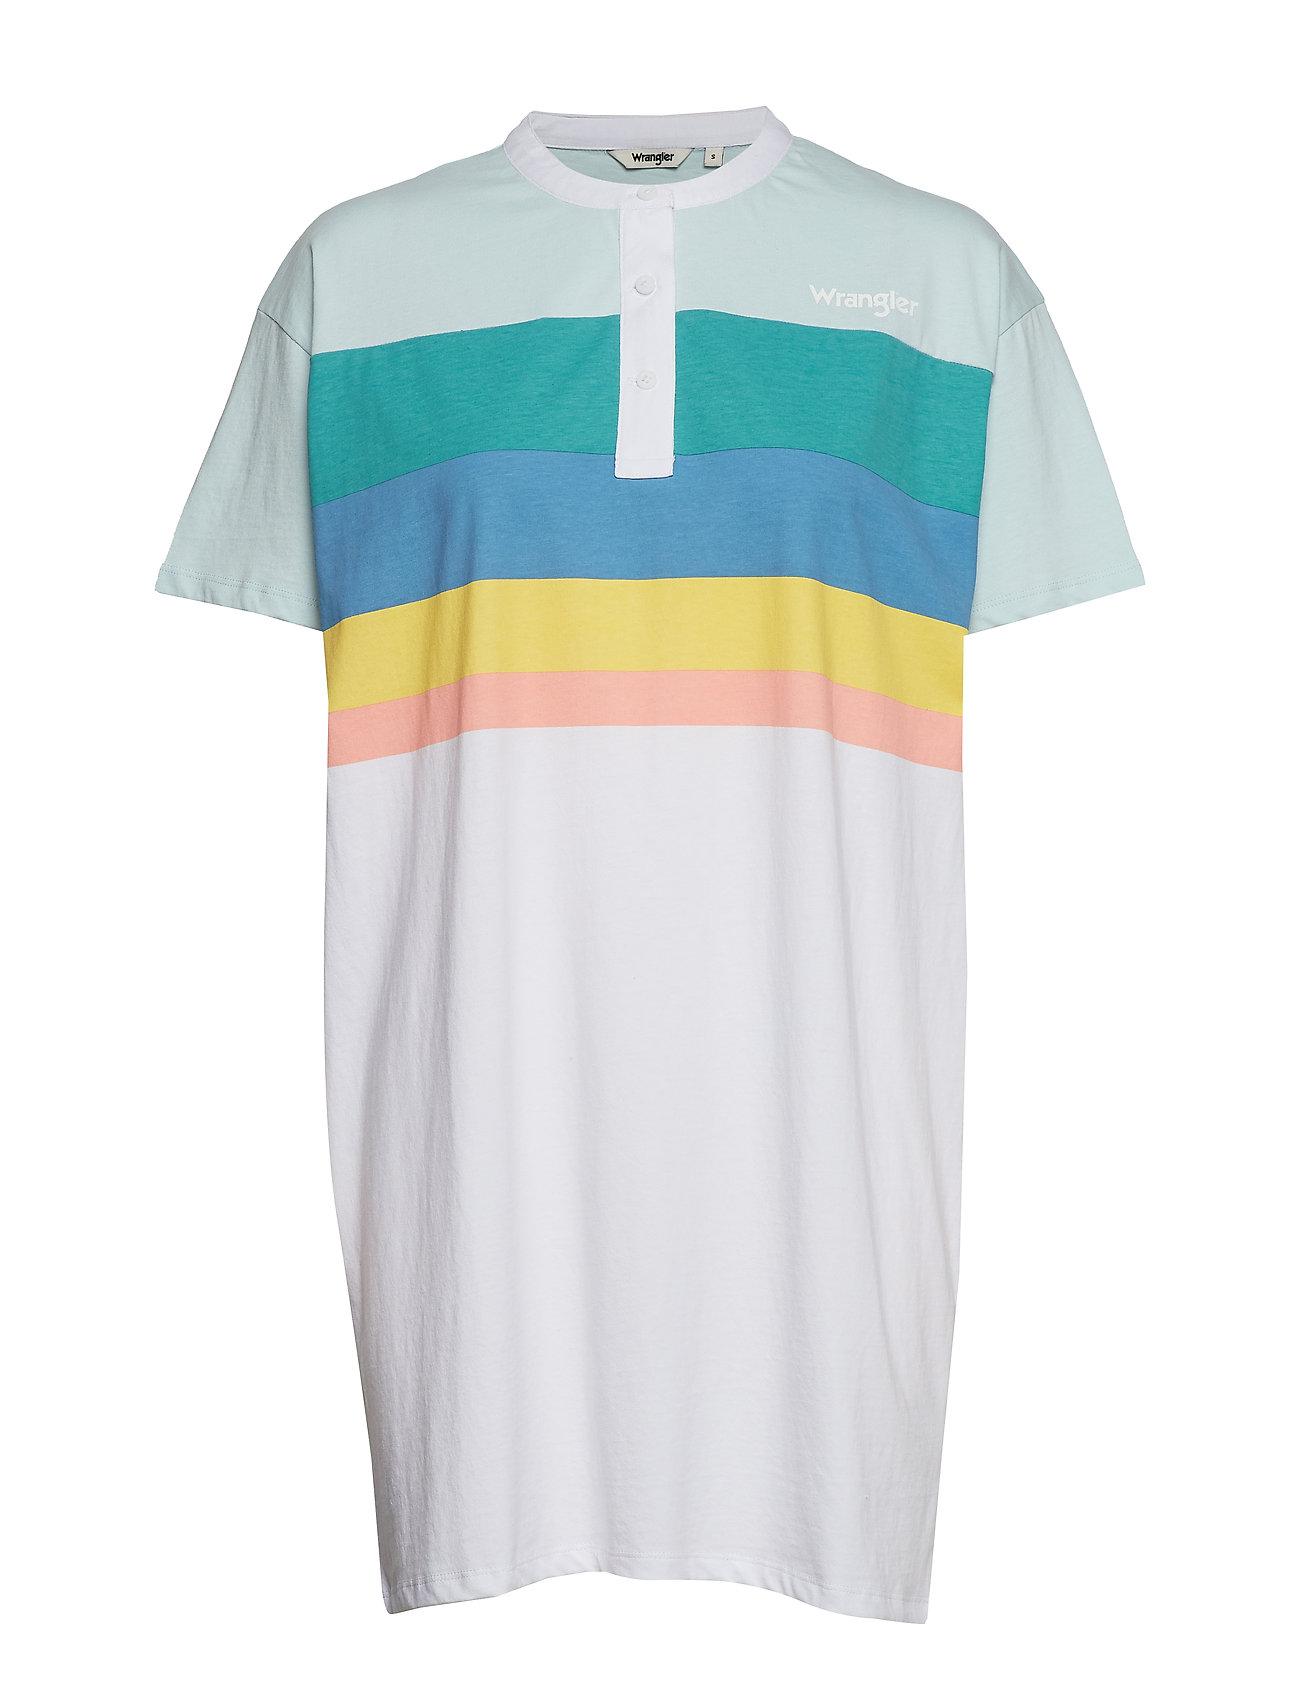 Wrangler POLO DRESS - WHITE